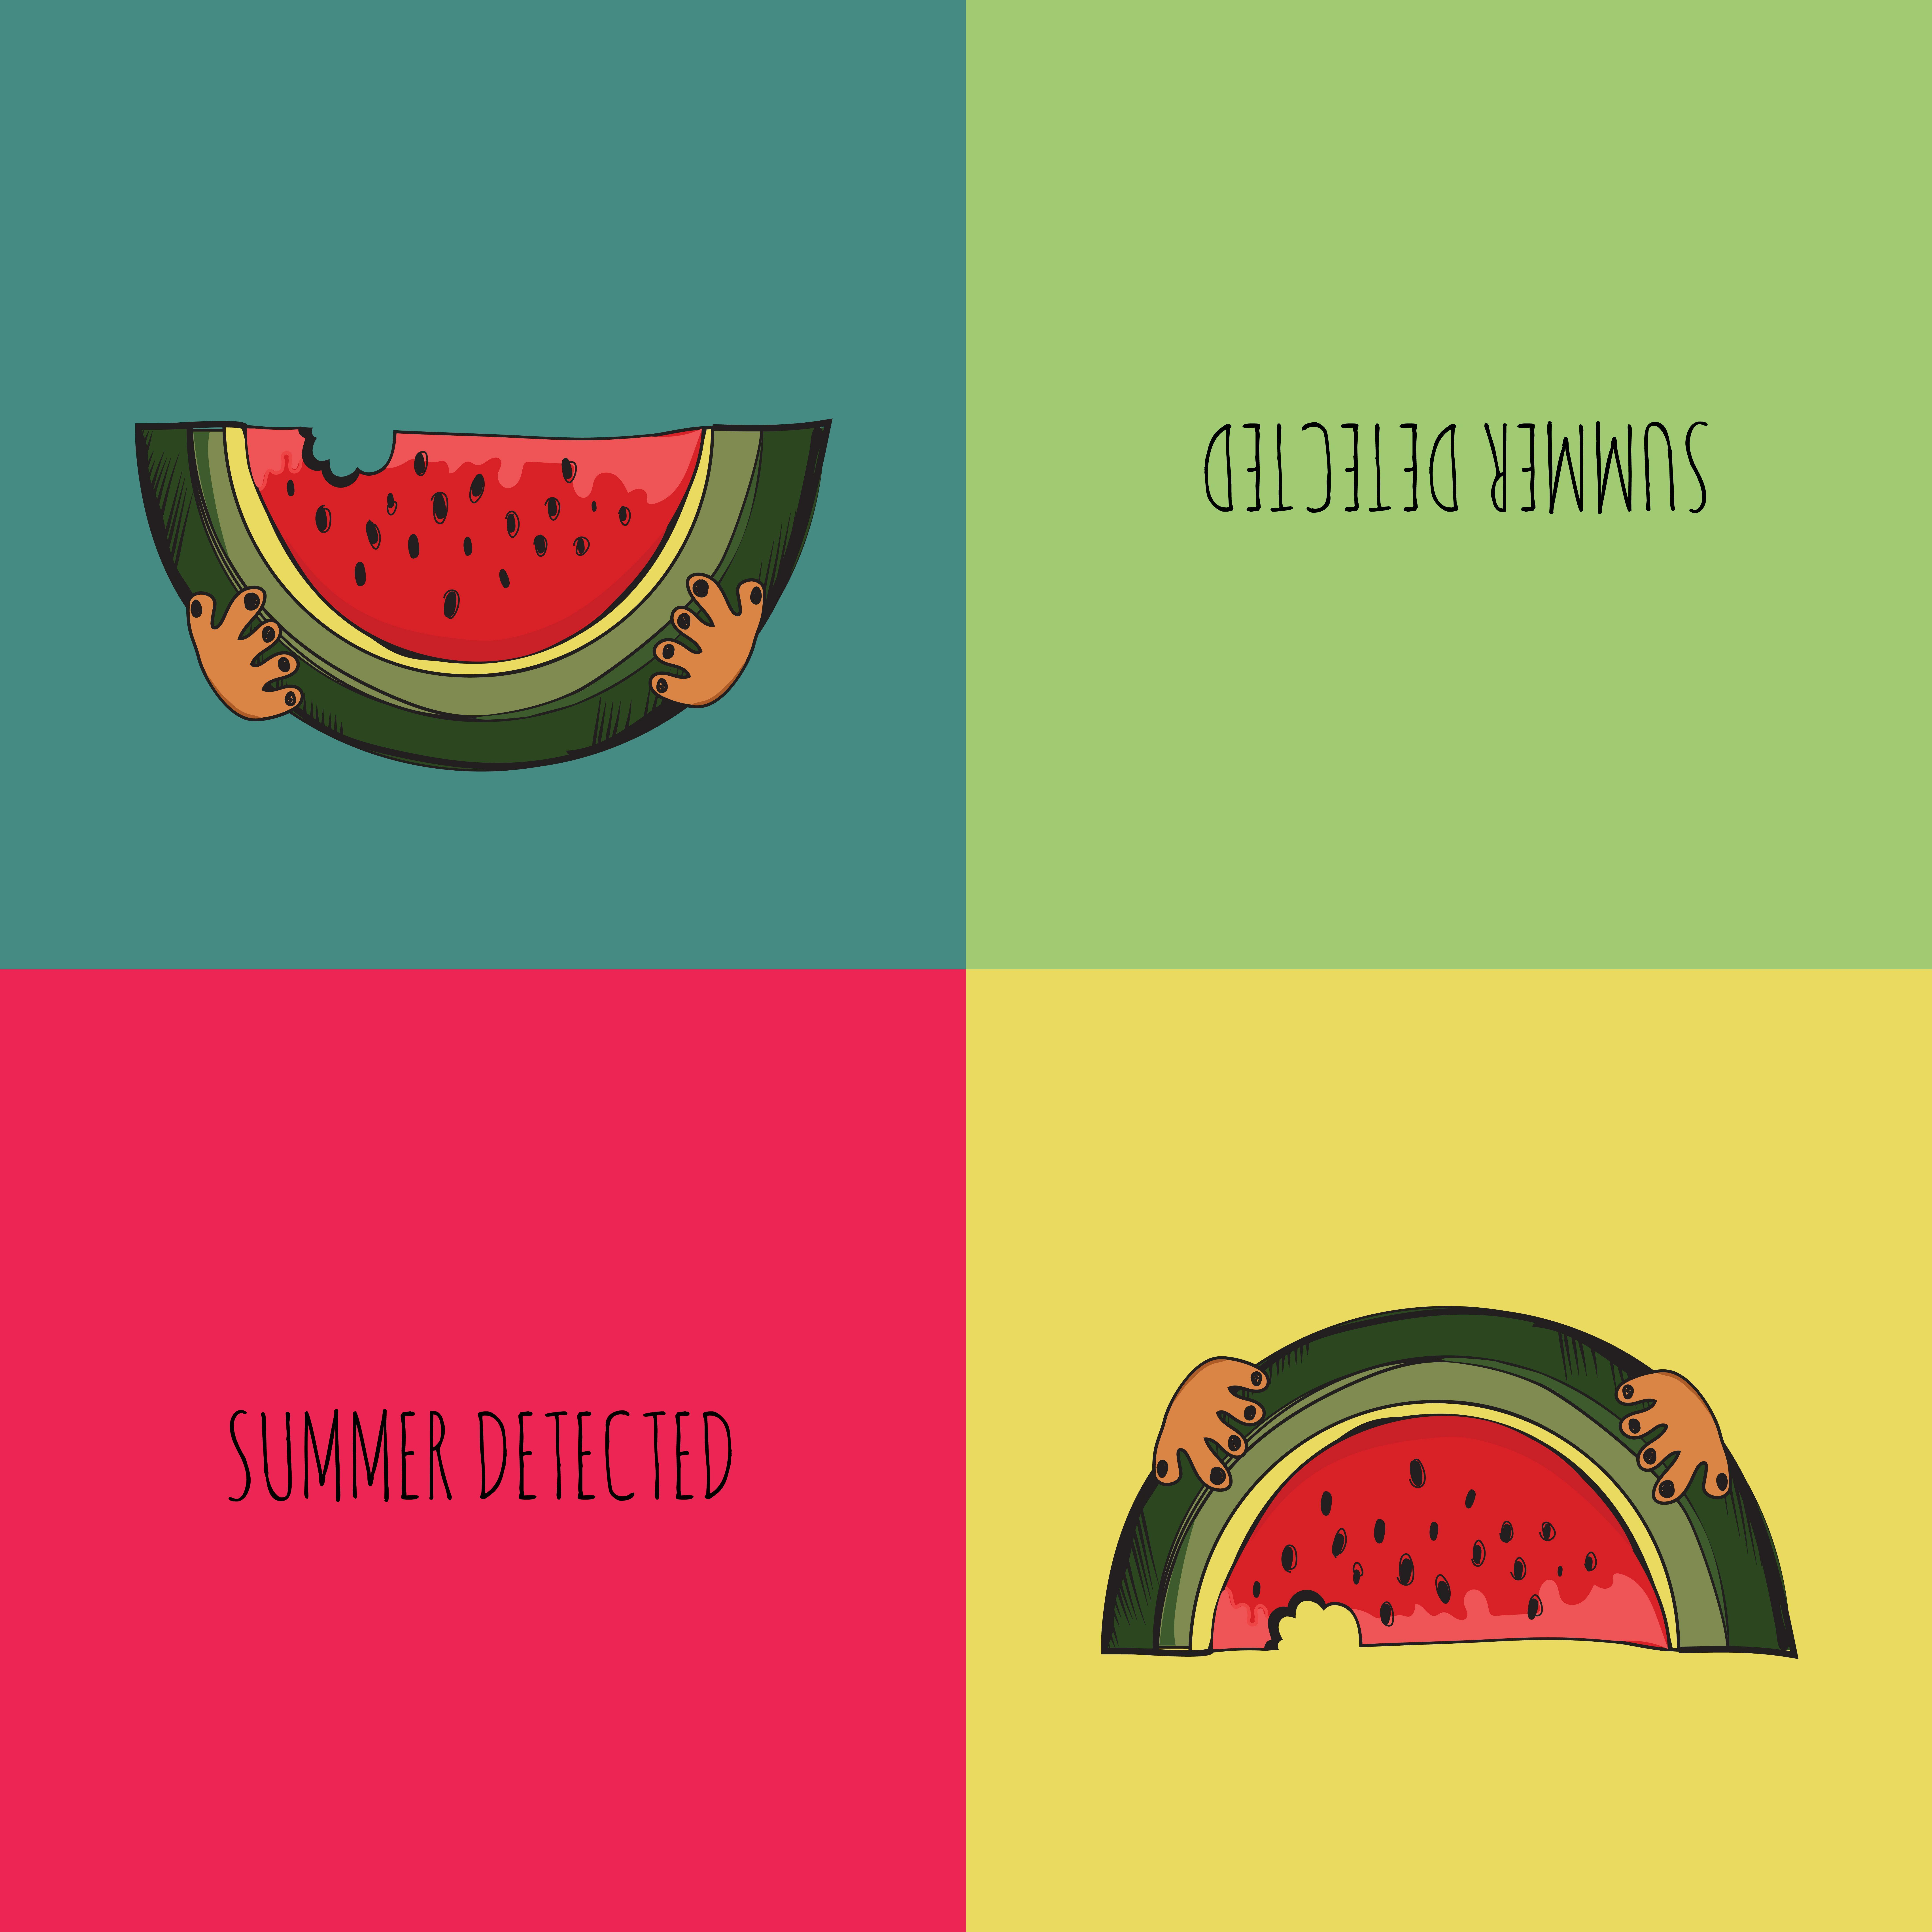 Watermelon poster, illustration, wall art, summer time illustration